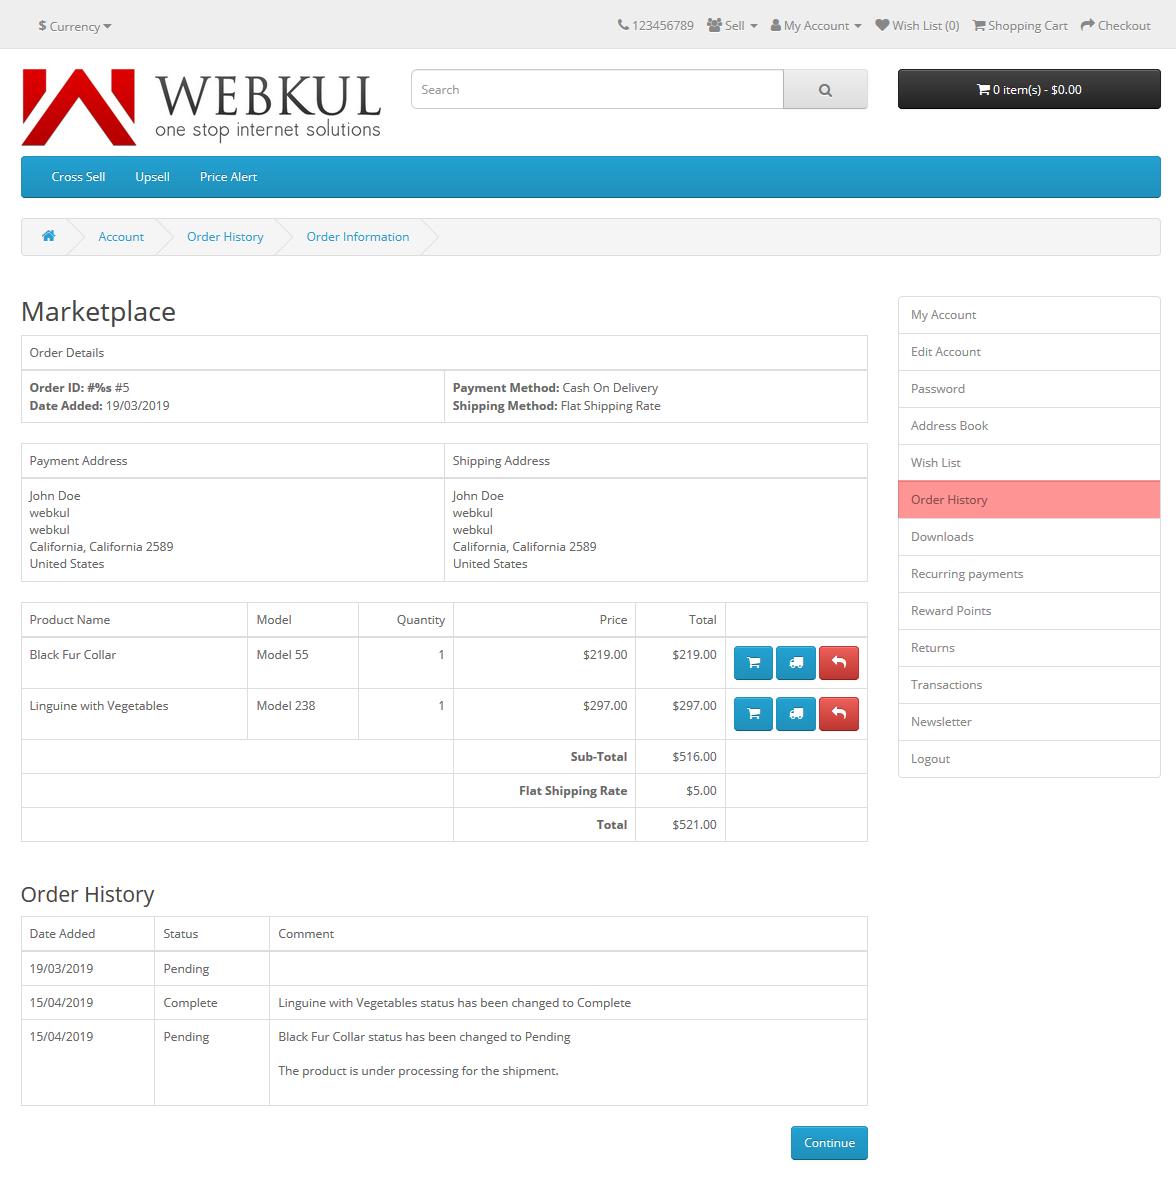 customer_order_details_view